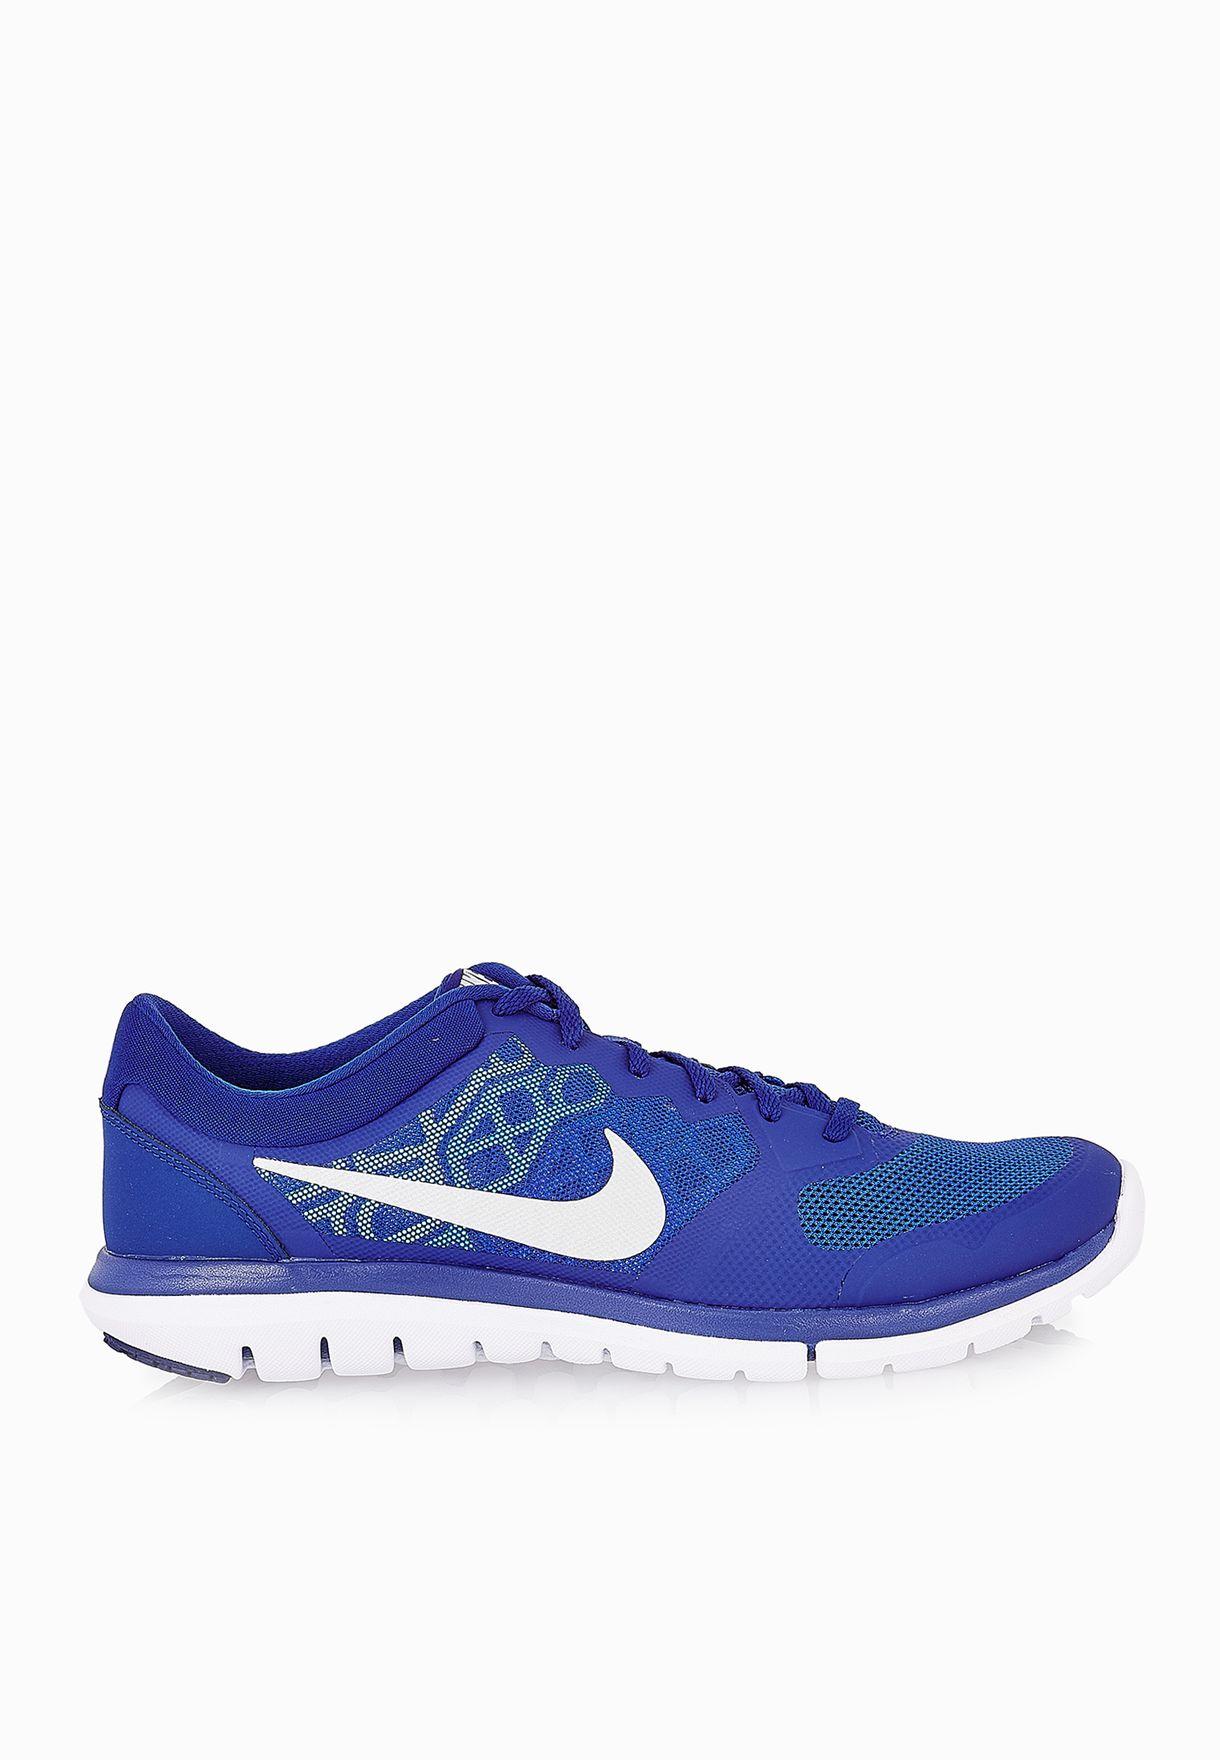 Infantil Arrepentimiento miel  Buy Nike blue Flex 2015 RN for Men in MENA, Worldwide | 709022-407